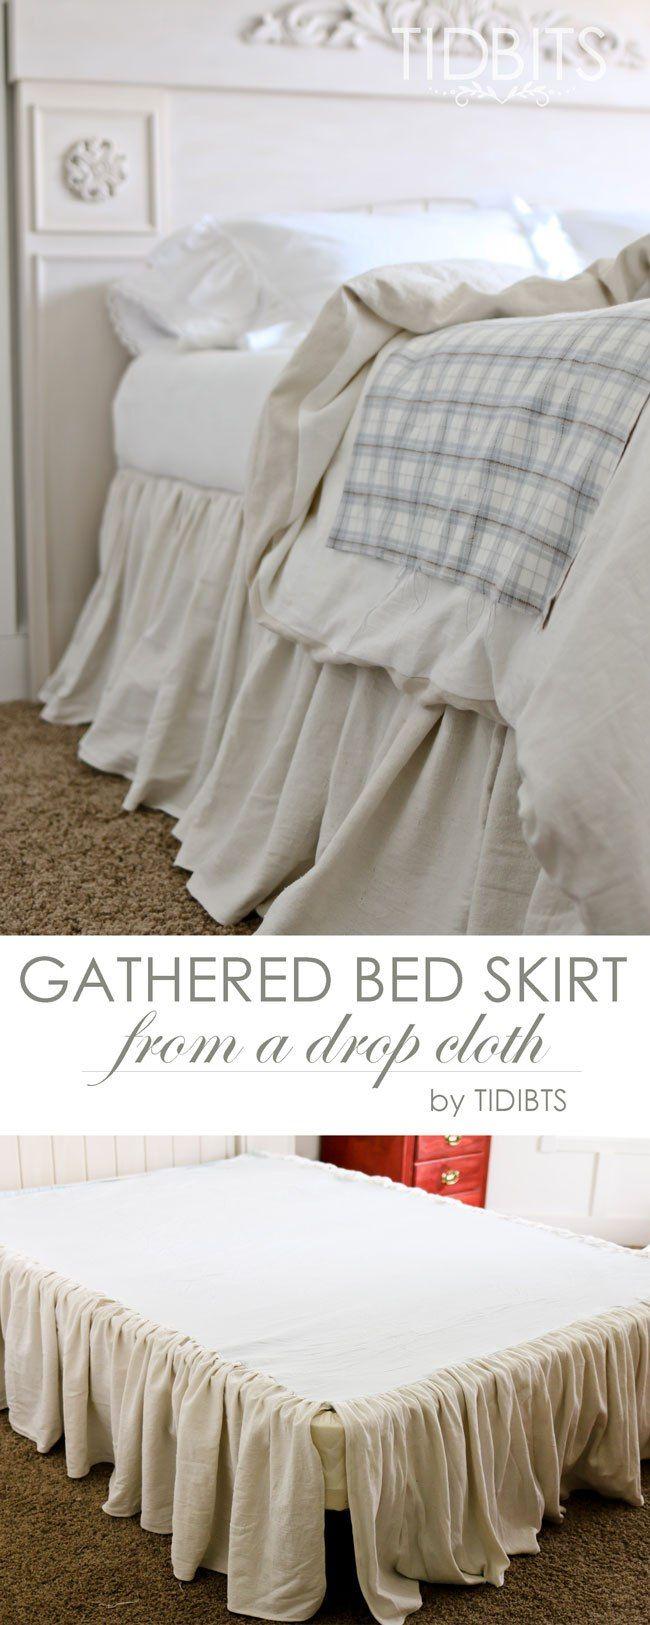 29 best drop cloth diy images on pinterest cloths drop cloths and